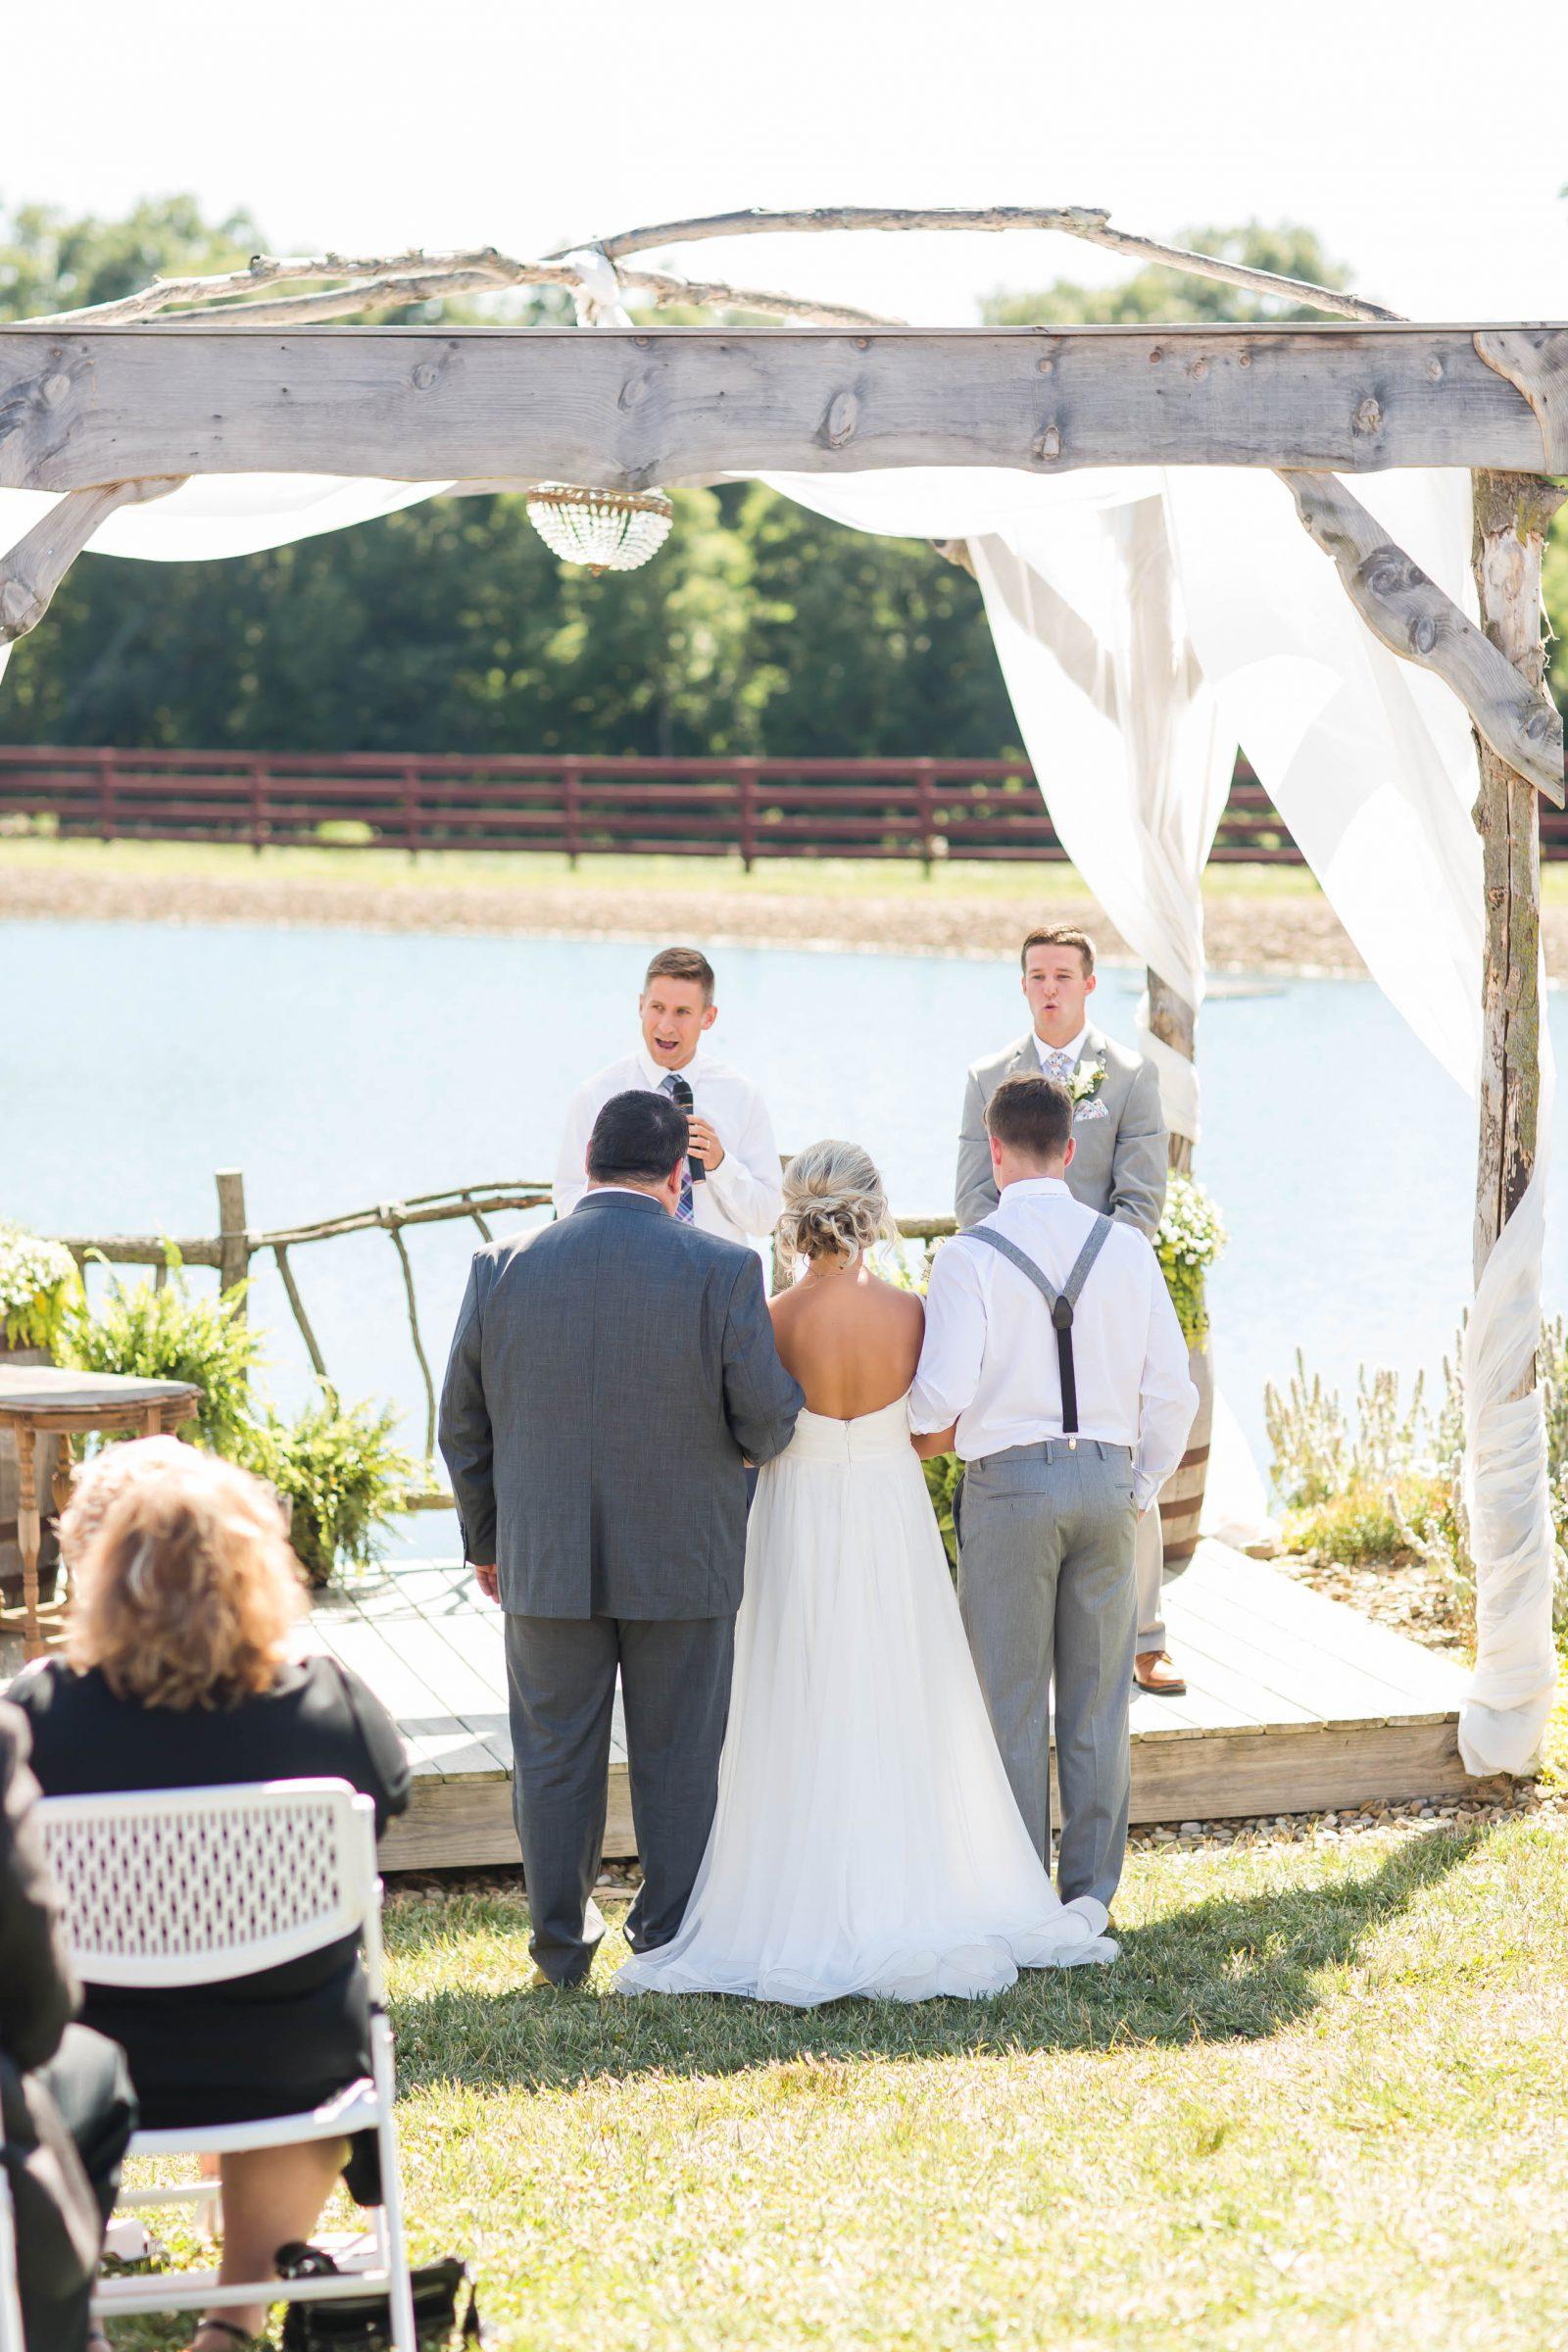 peacock-ridge-summer-wedding-photographer-akron-ohio-loren-jackson-photography-71